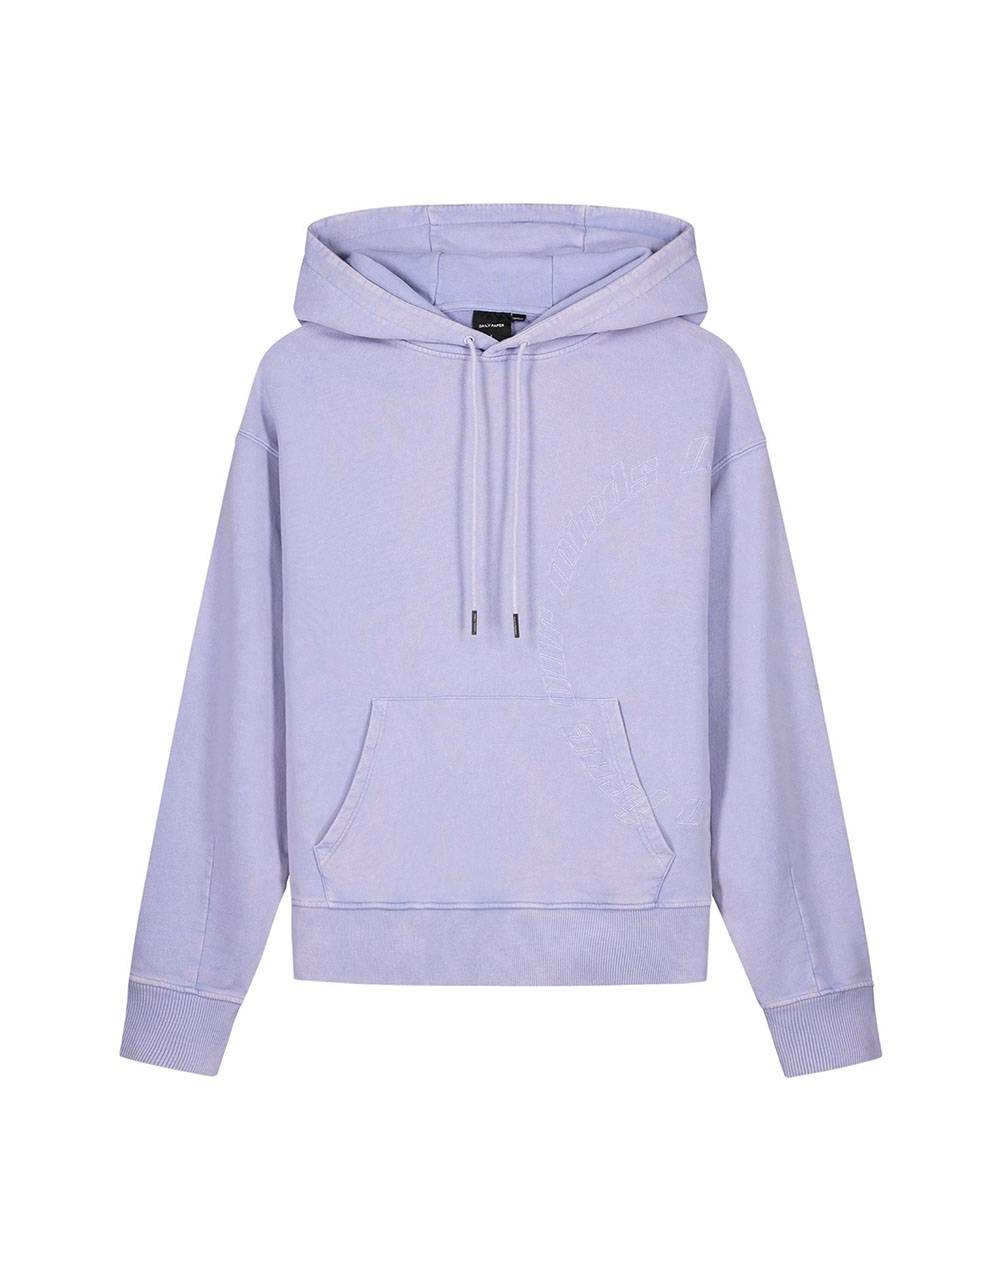 Daily Paper Kalcid hoodie - jacaranda purple DAILY PAPER Sweater 165,00€